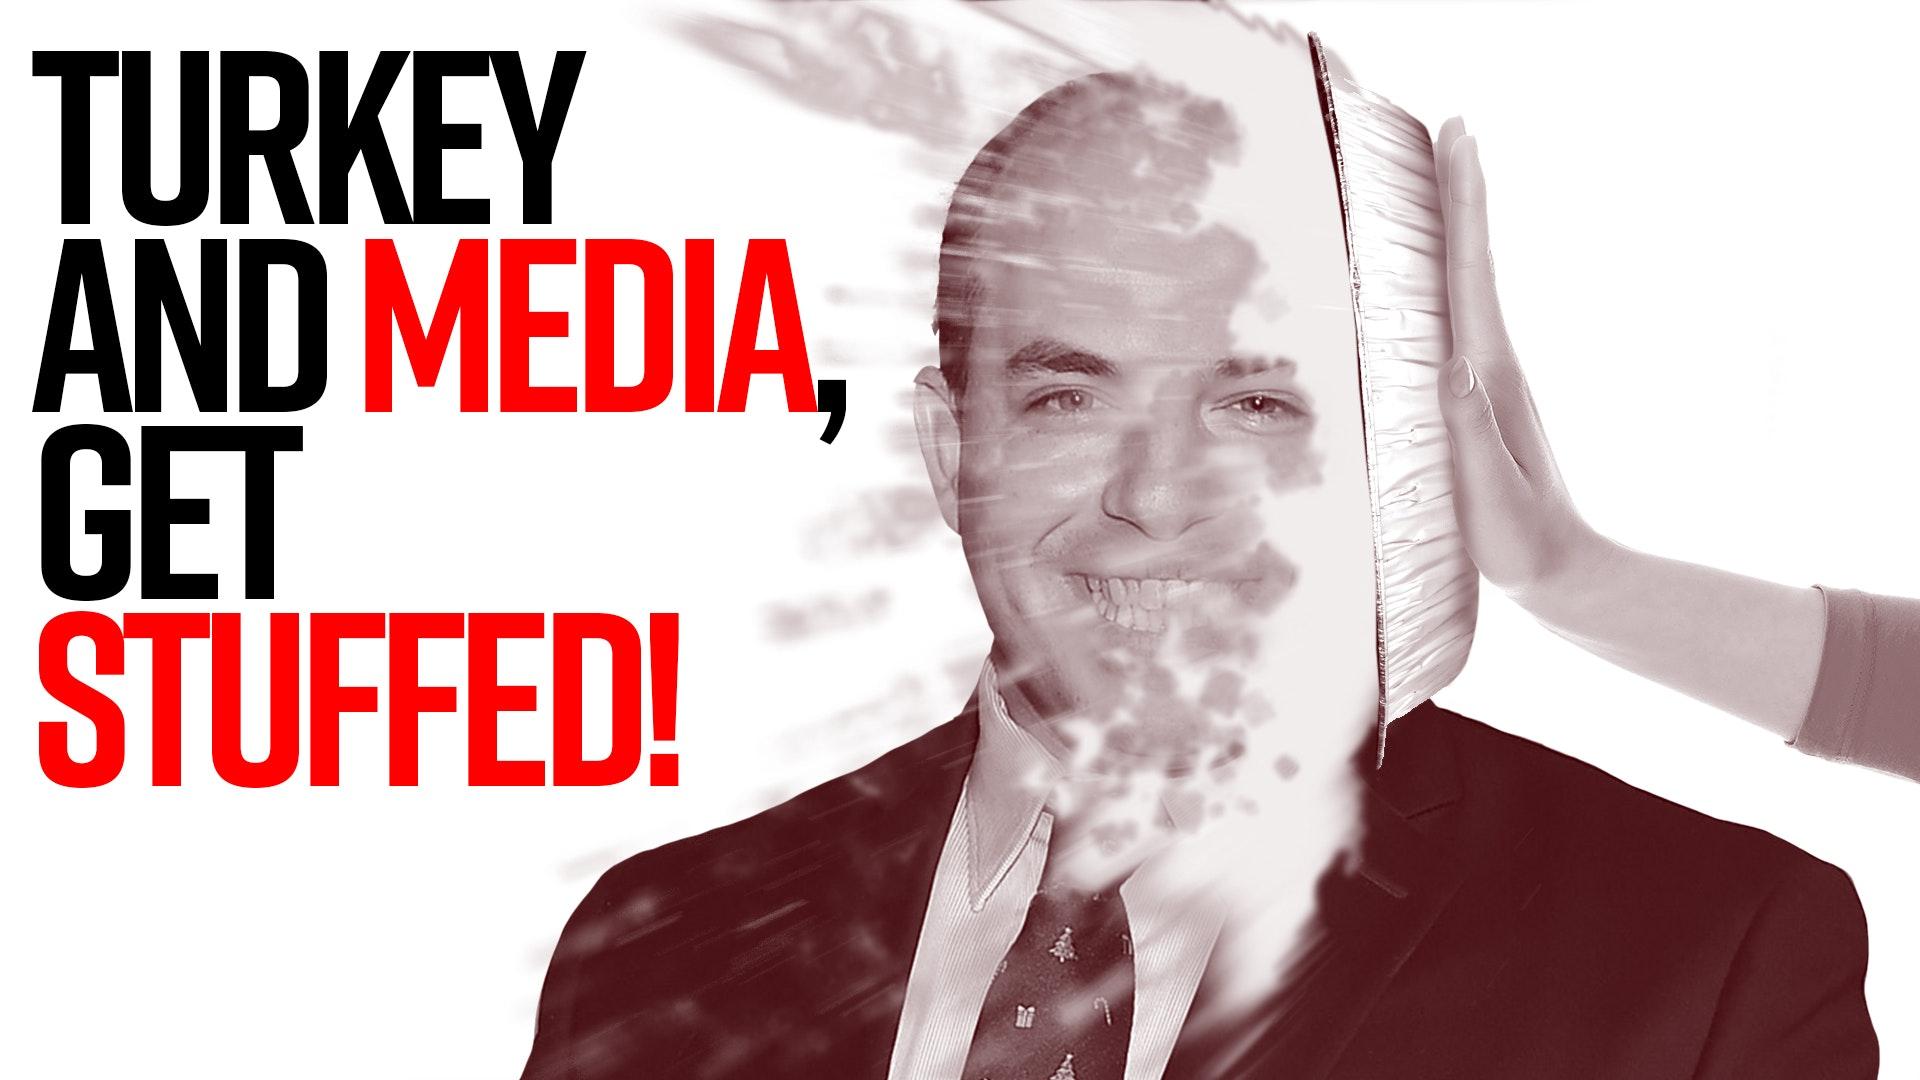 Ep. 1001 - Turkey and Media, Get Stuffed!